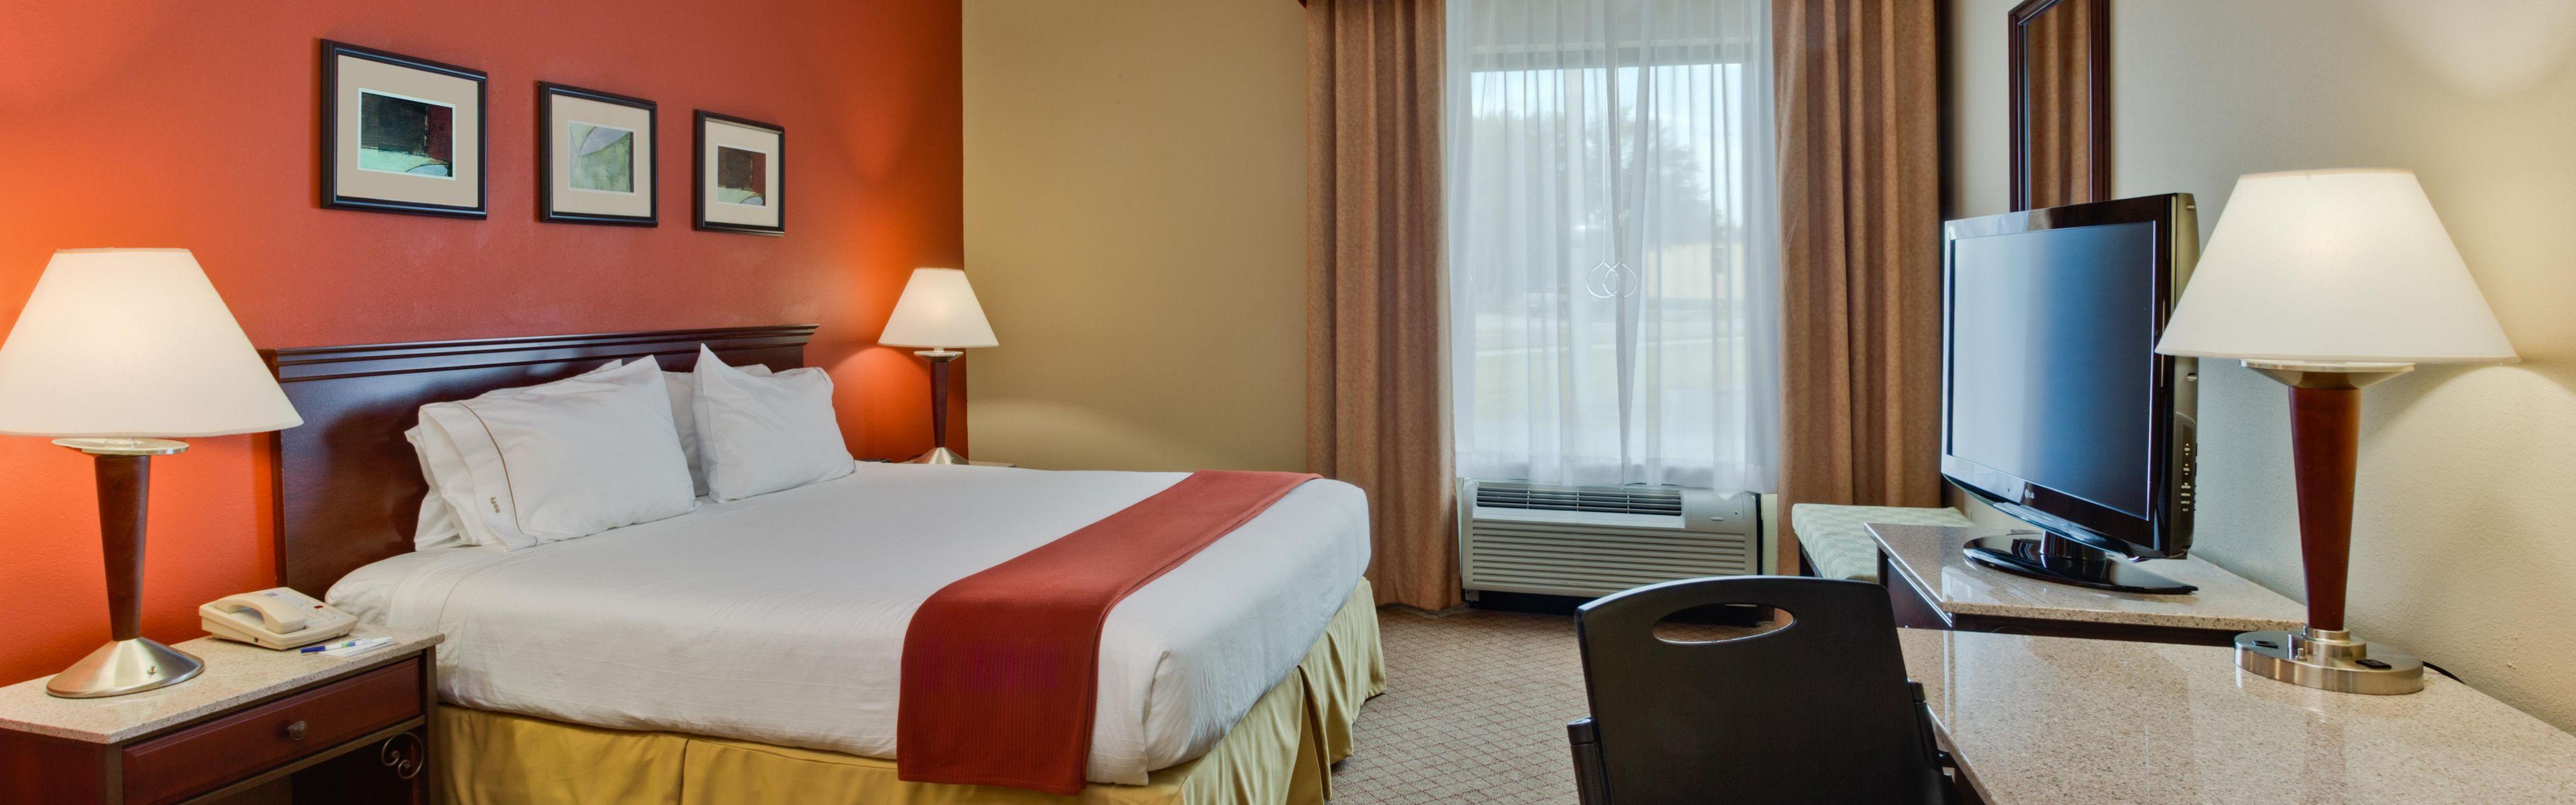 Hotels Near Me Oldsmar Fl